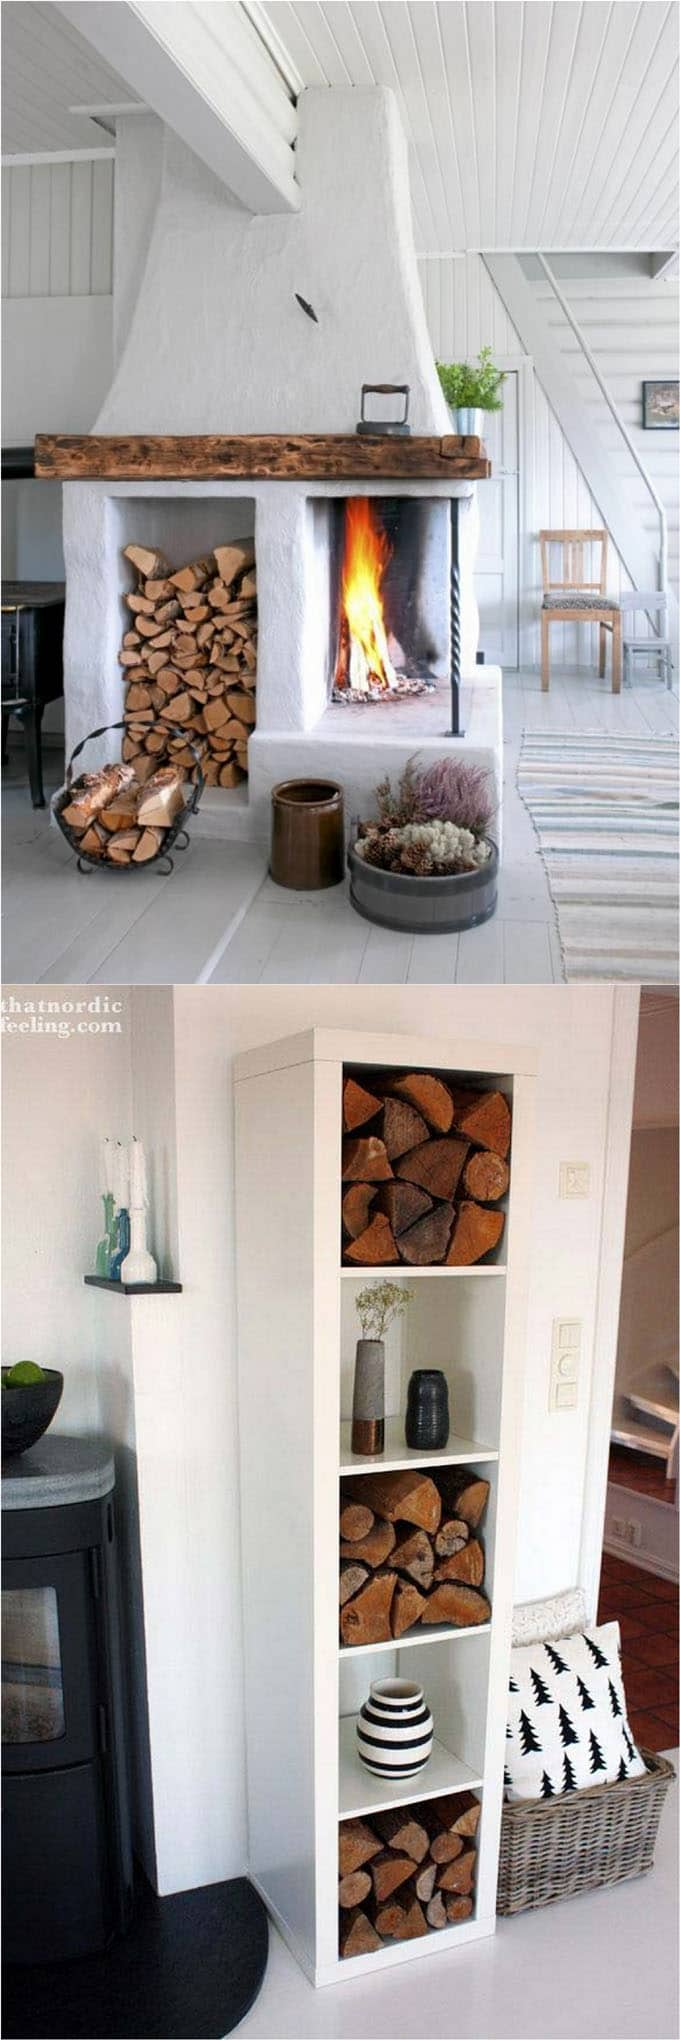 living room firewood holder small kitchen dining design 15 amazing rack best storage ideas a piece of rainbow apieceofrainbow 4